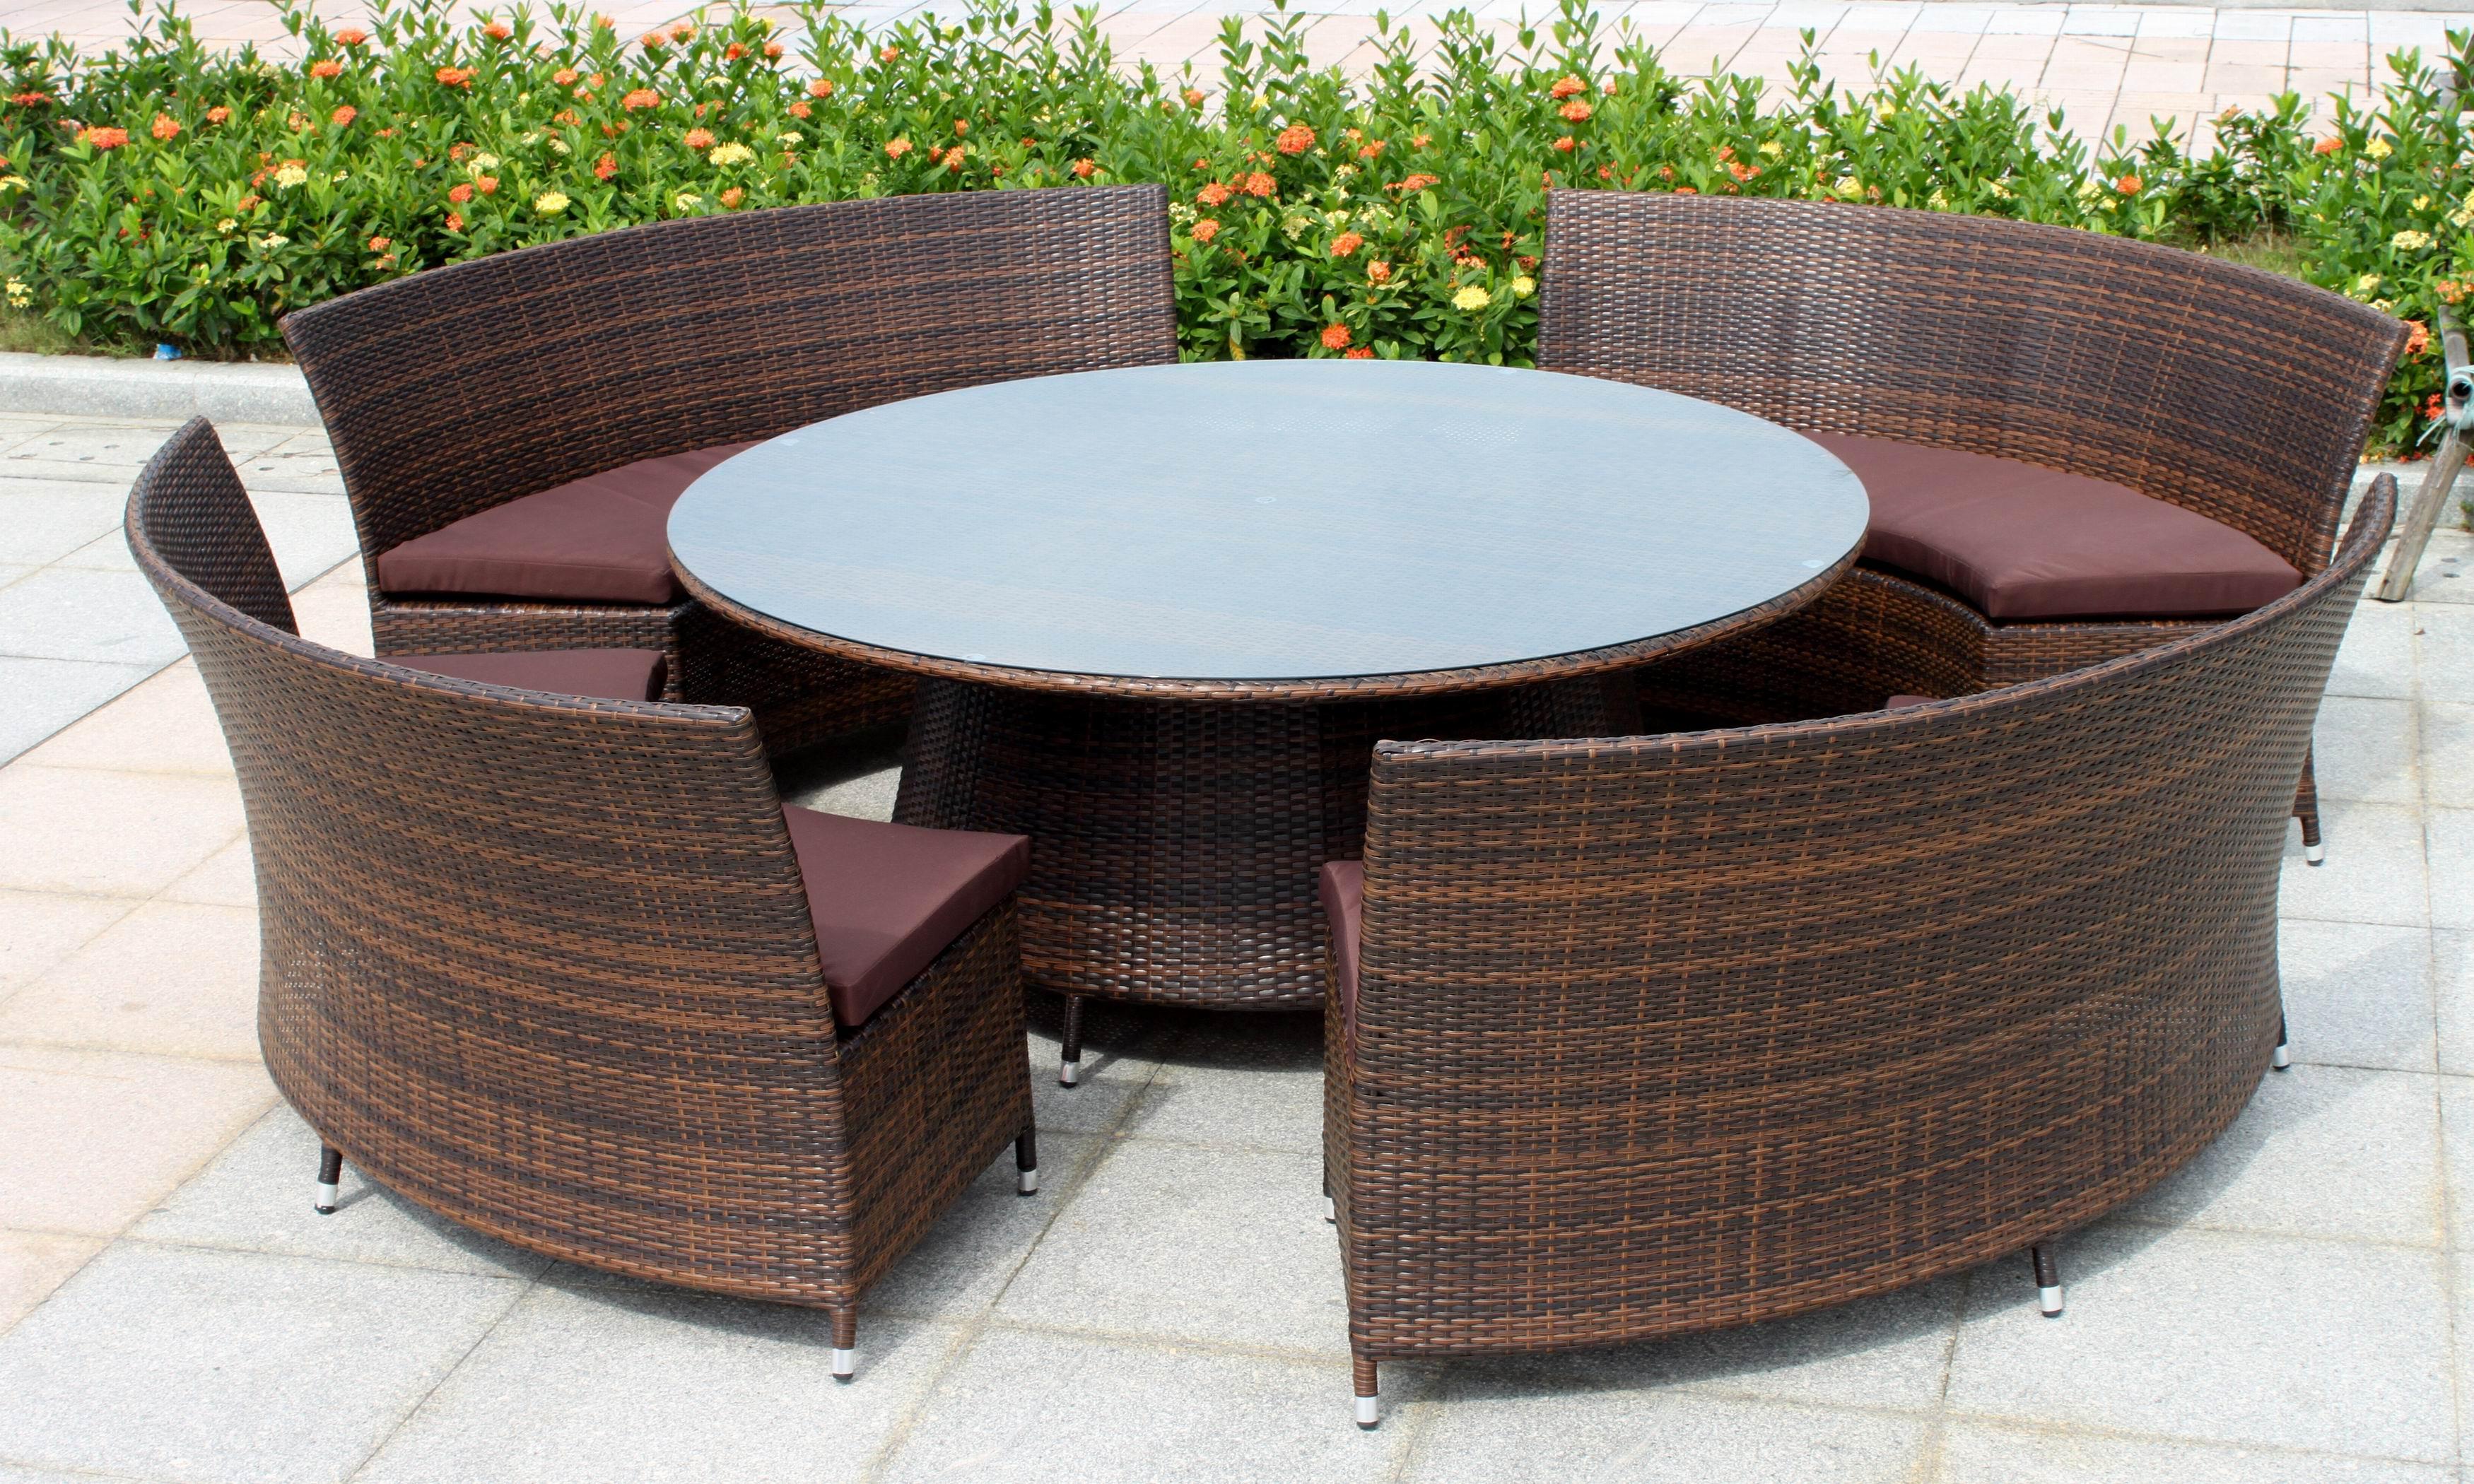 Reasonable outdoor wicker furniture for your garden